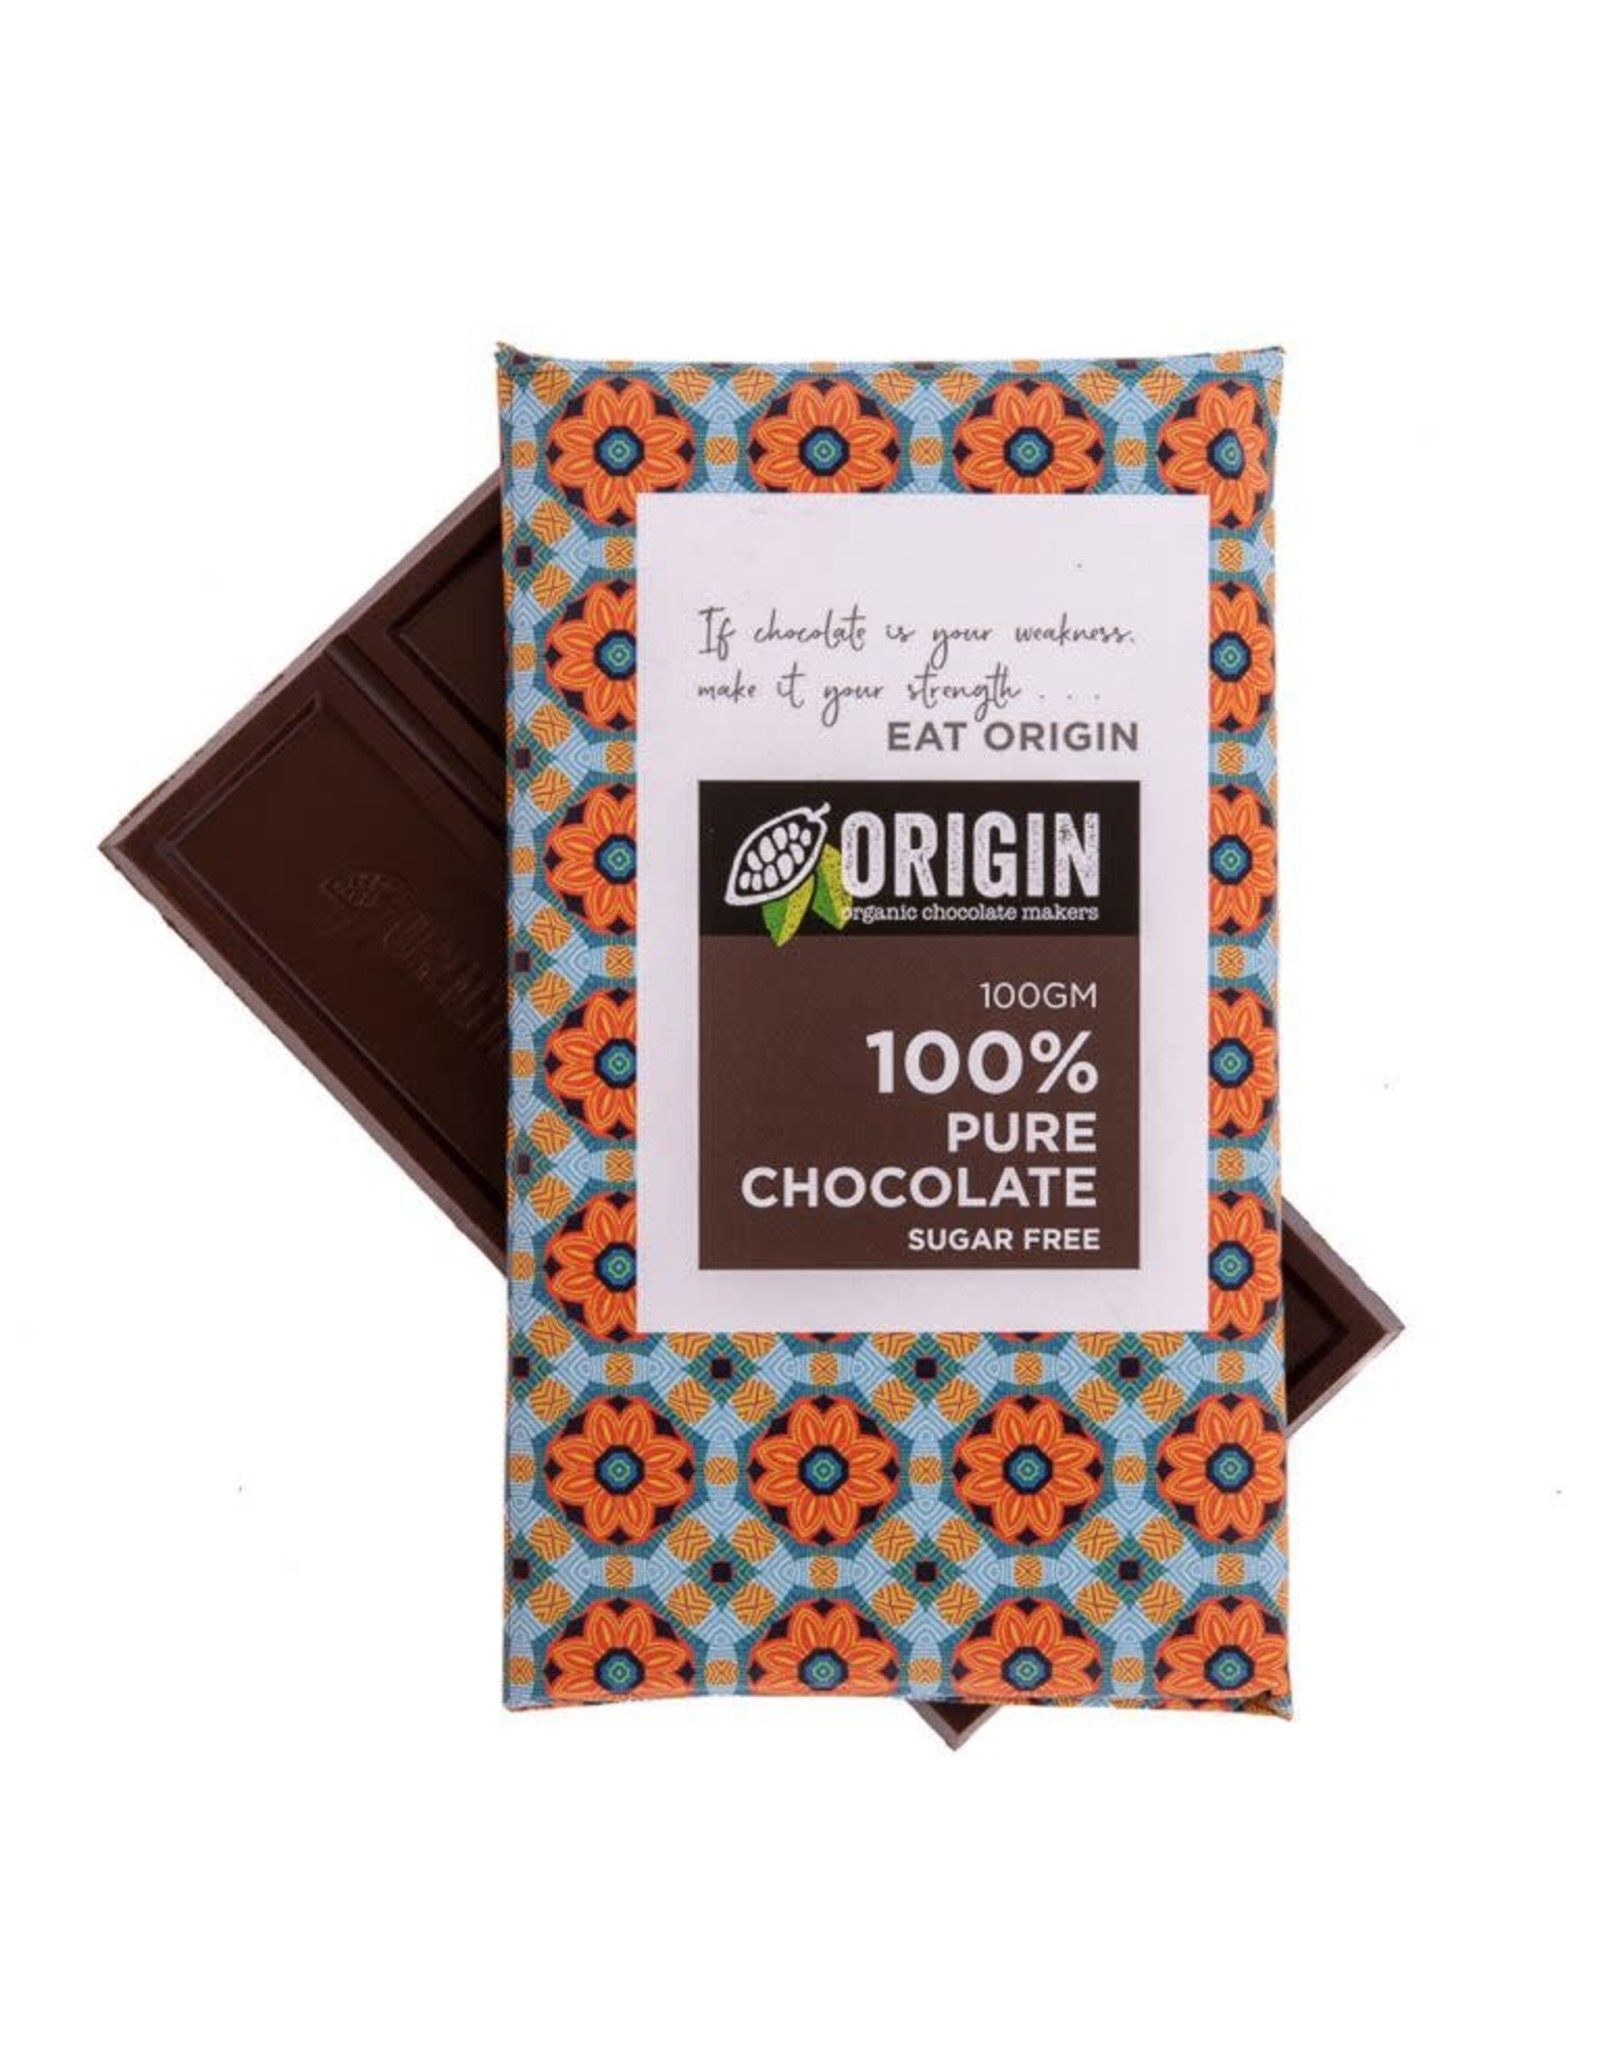 Origin Chocolate 100% Pure Cacao Vegan Chocolate 100gm